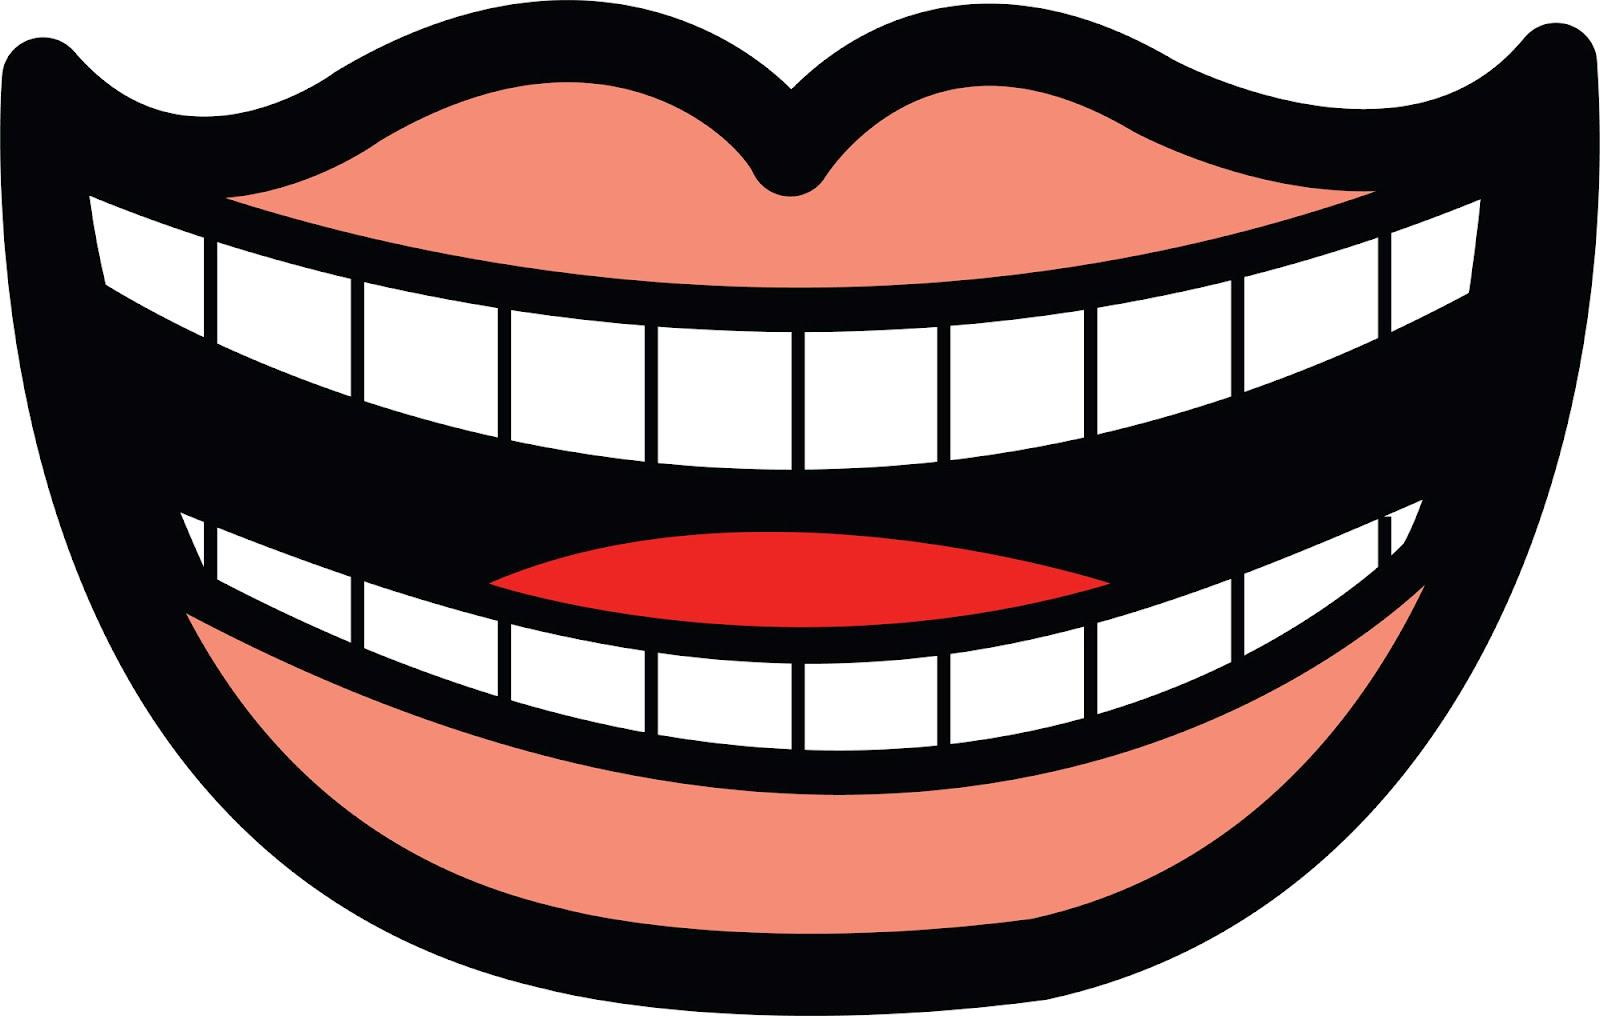 1600x1016 Quiet Mouth Clip Art Free Clipart Images 2